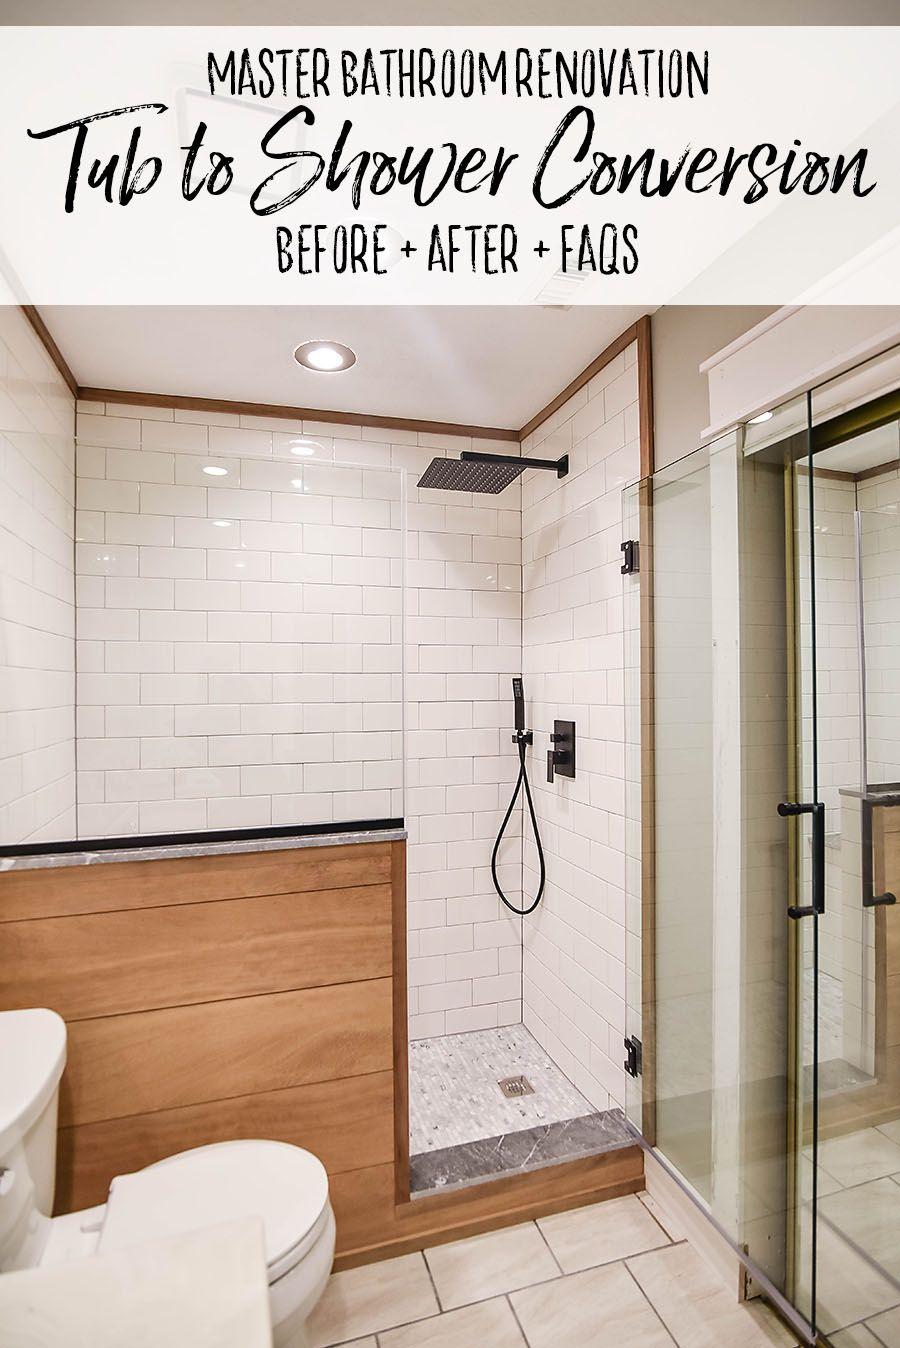 Master Bathroom Renovation Converting A Bathtub Into A Walk In